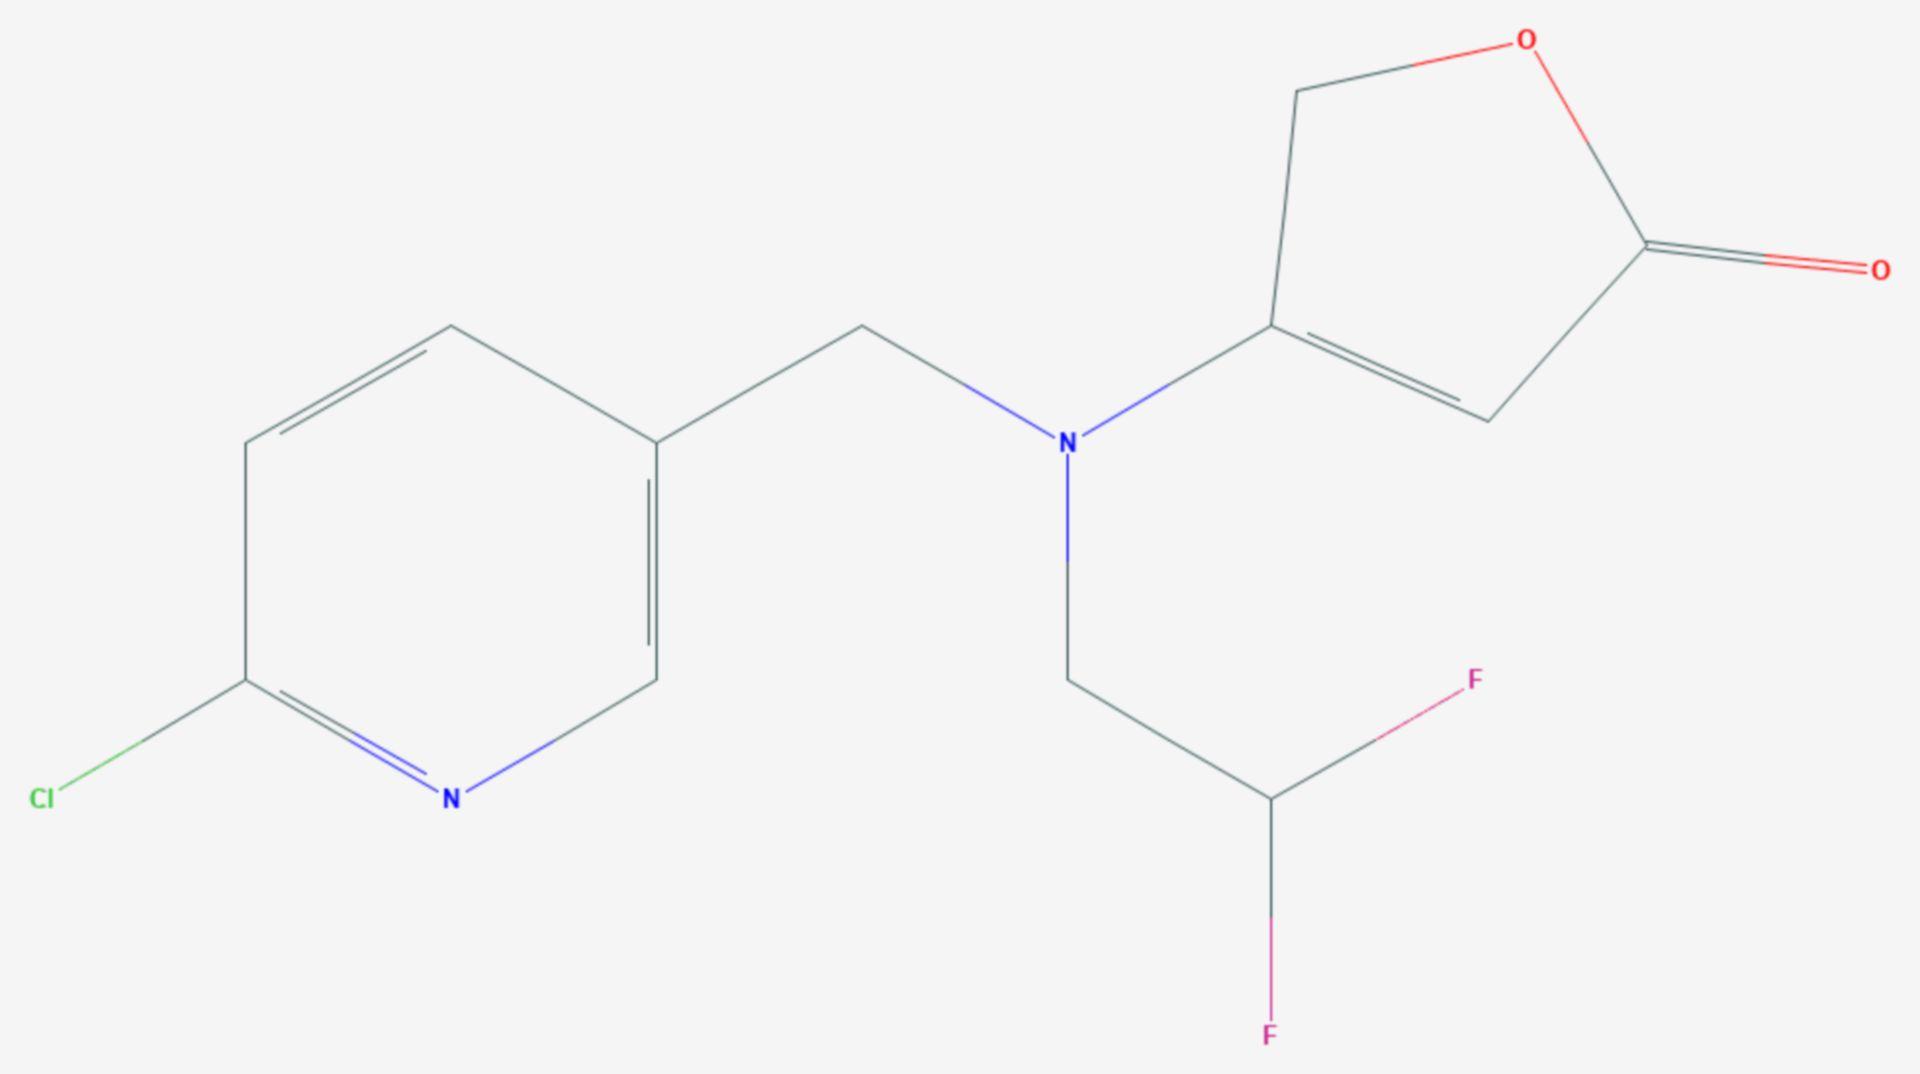 Flupyradifuron (Strukturformel)